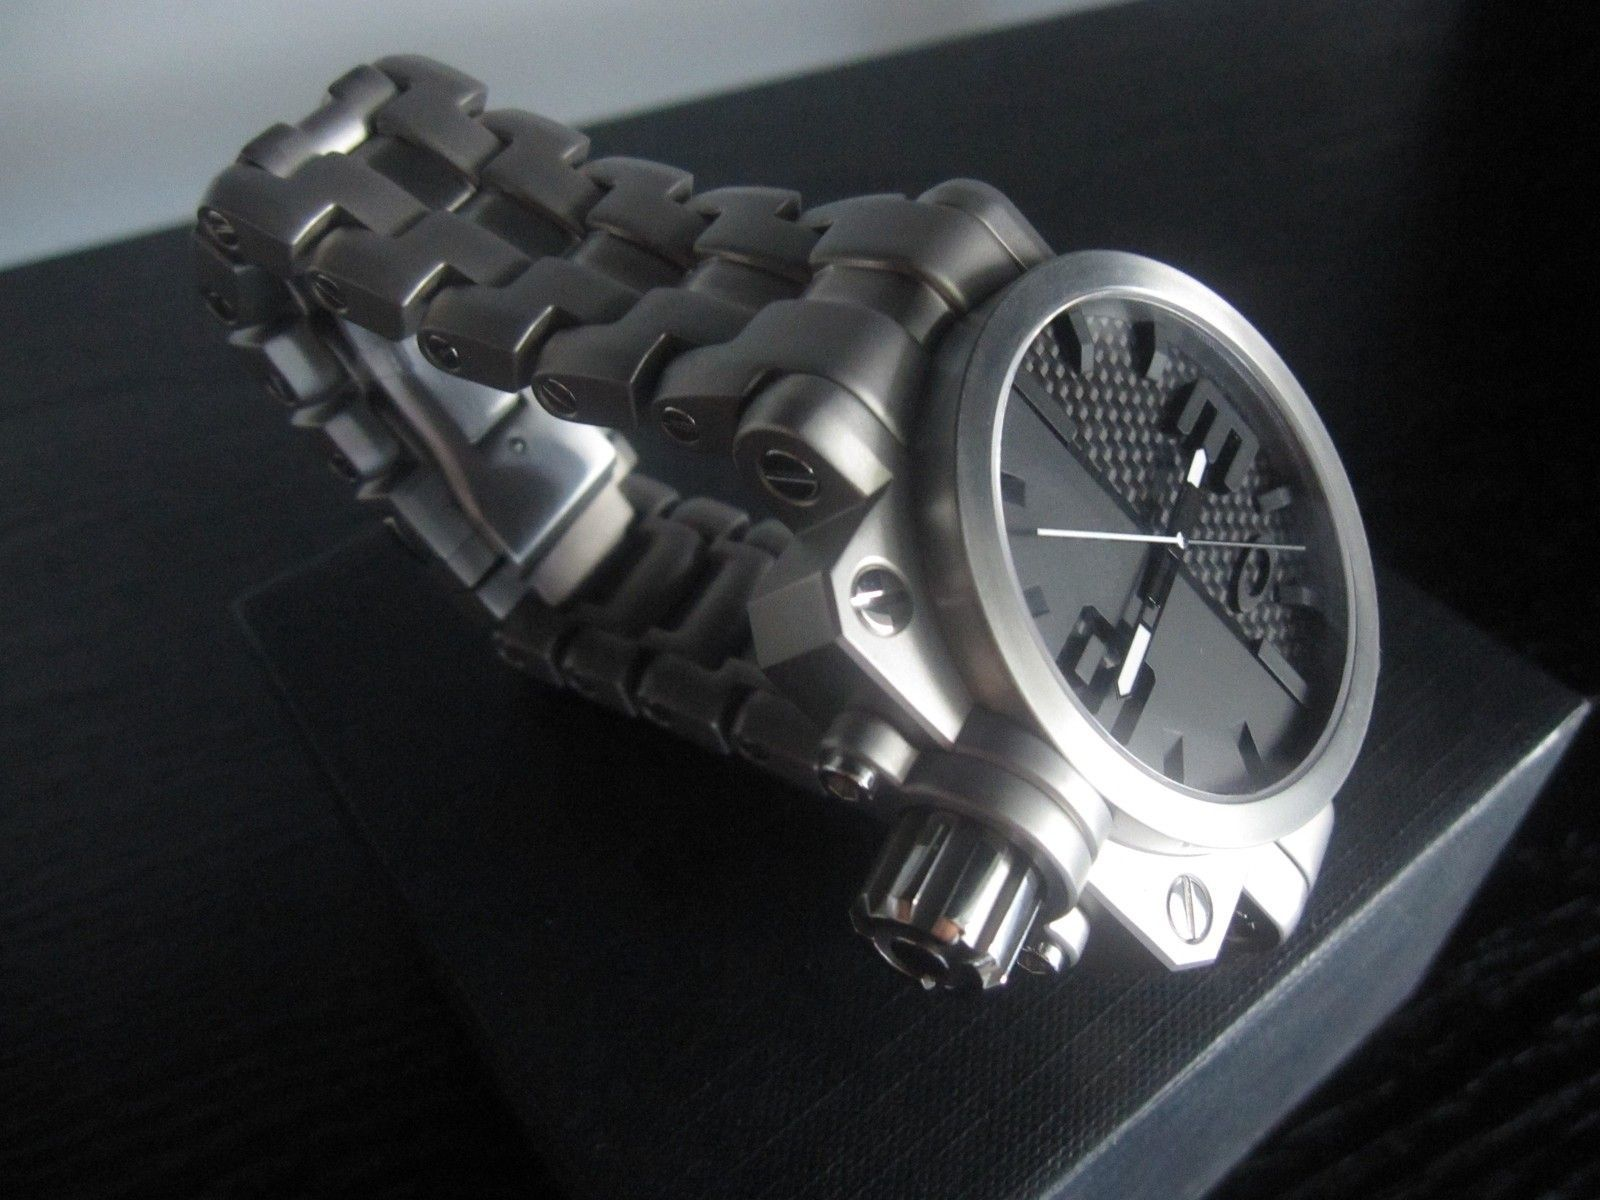 BNIB Gearbox Titanium Bracelet Watch - OW0004-01 - IMG_2496.JPG